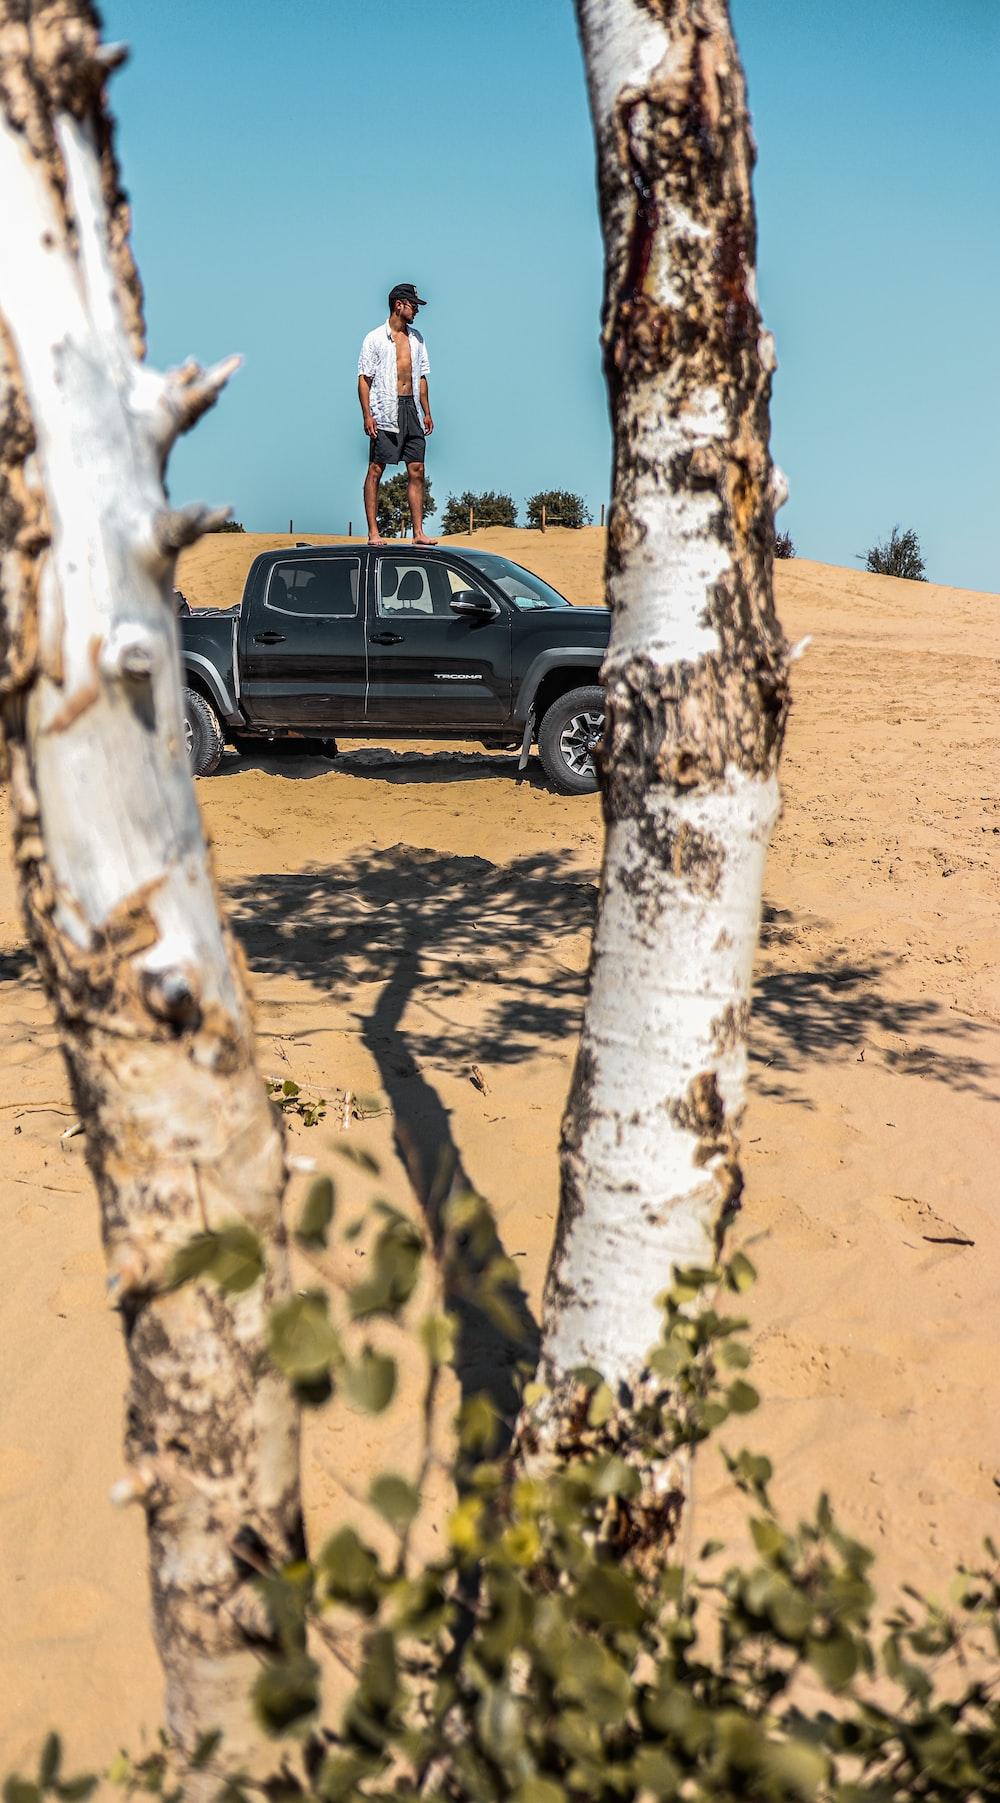 black suv on brown sand during daytime